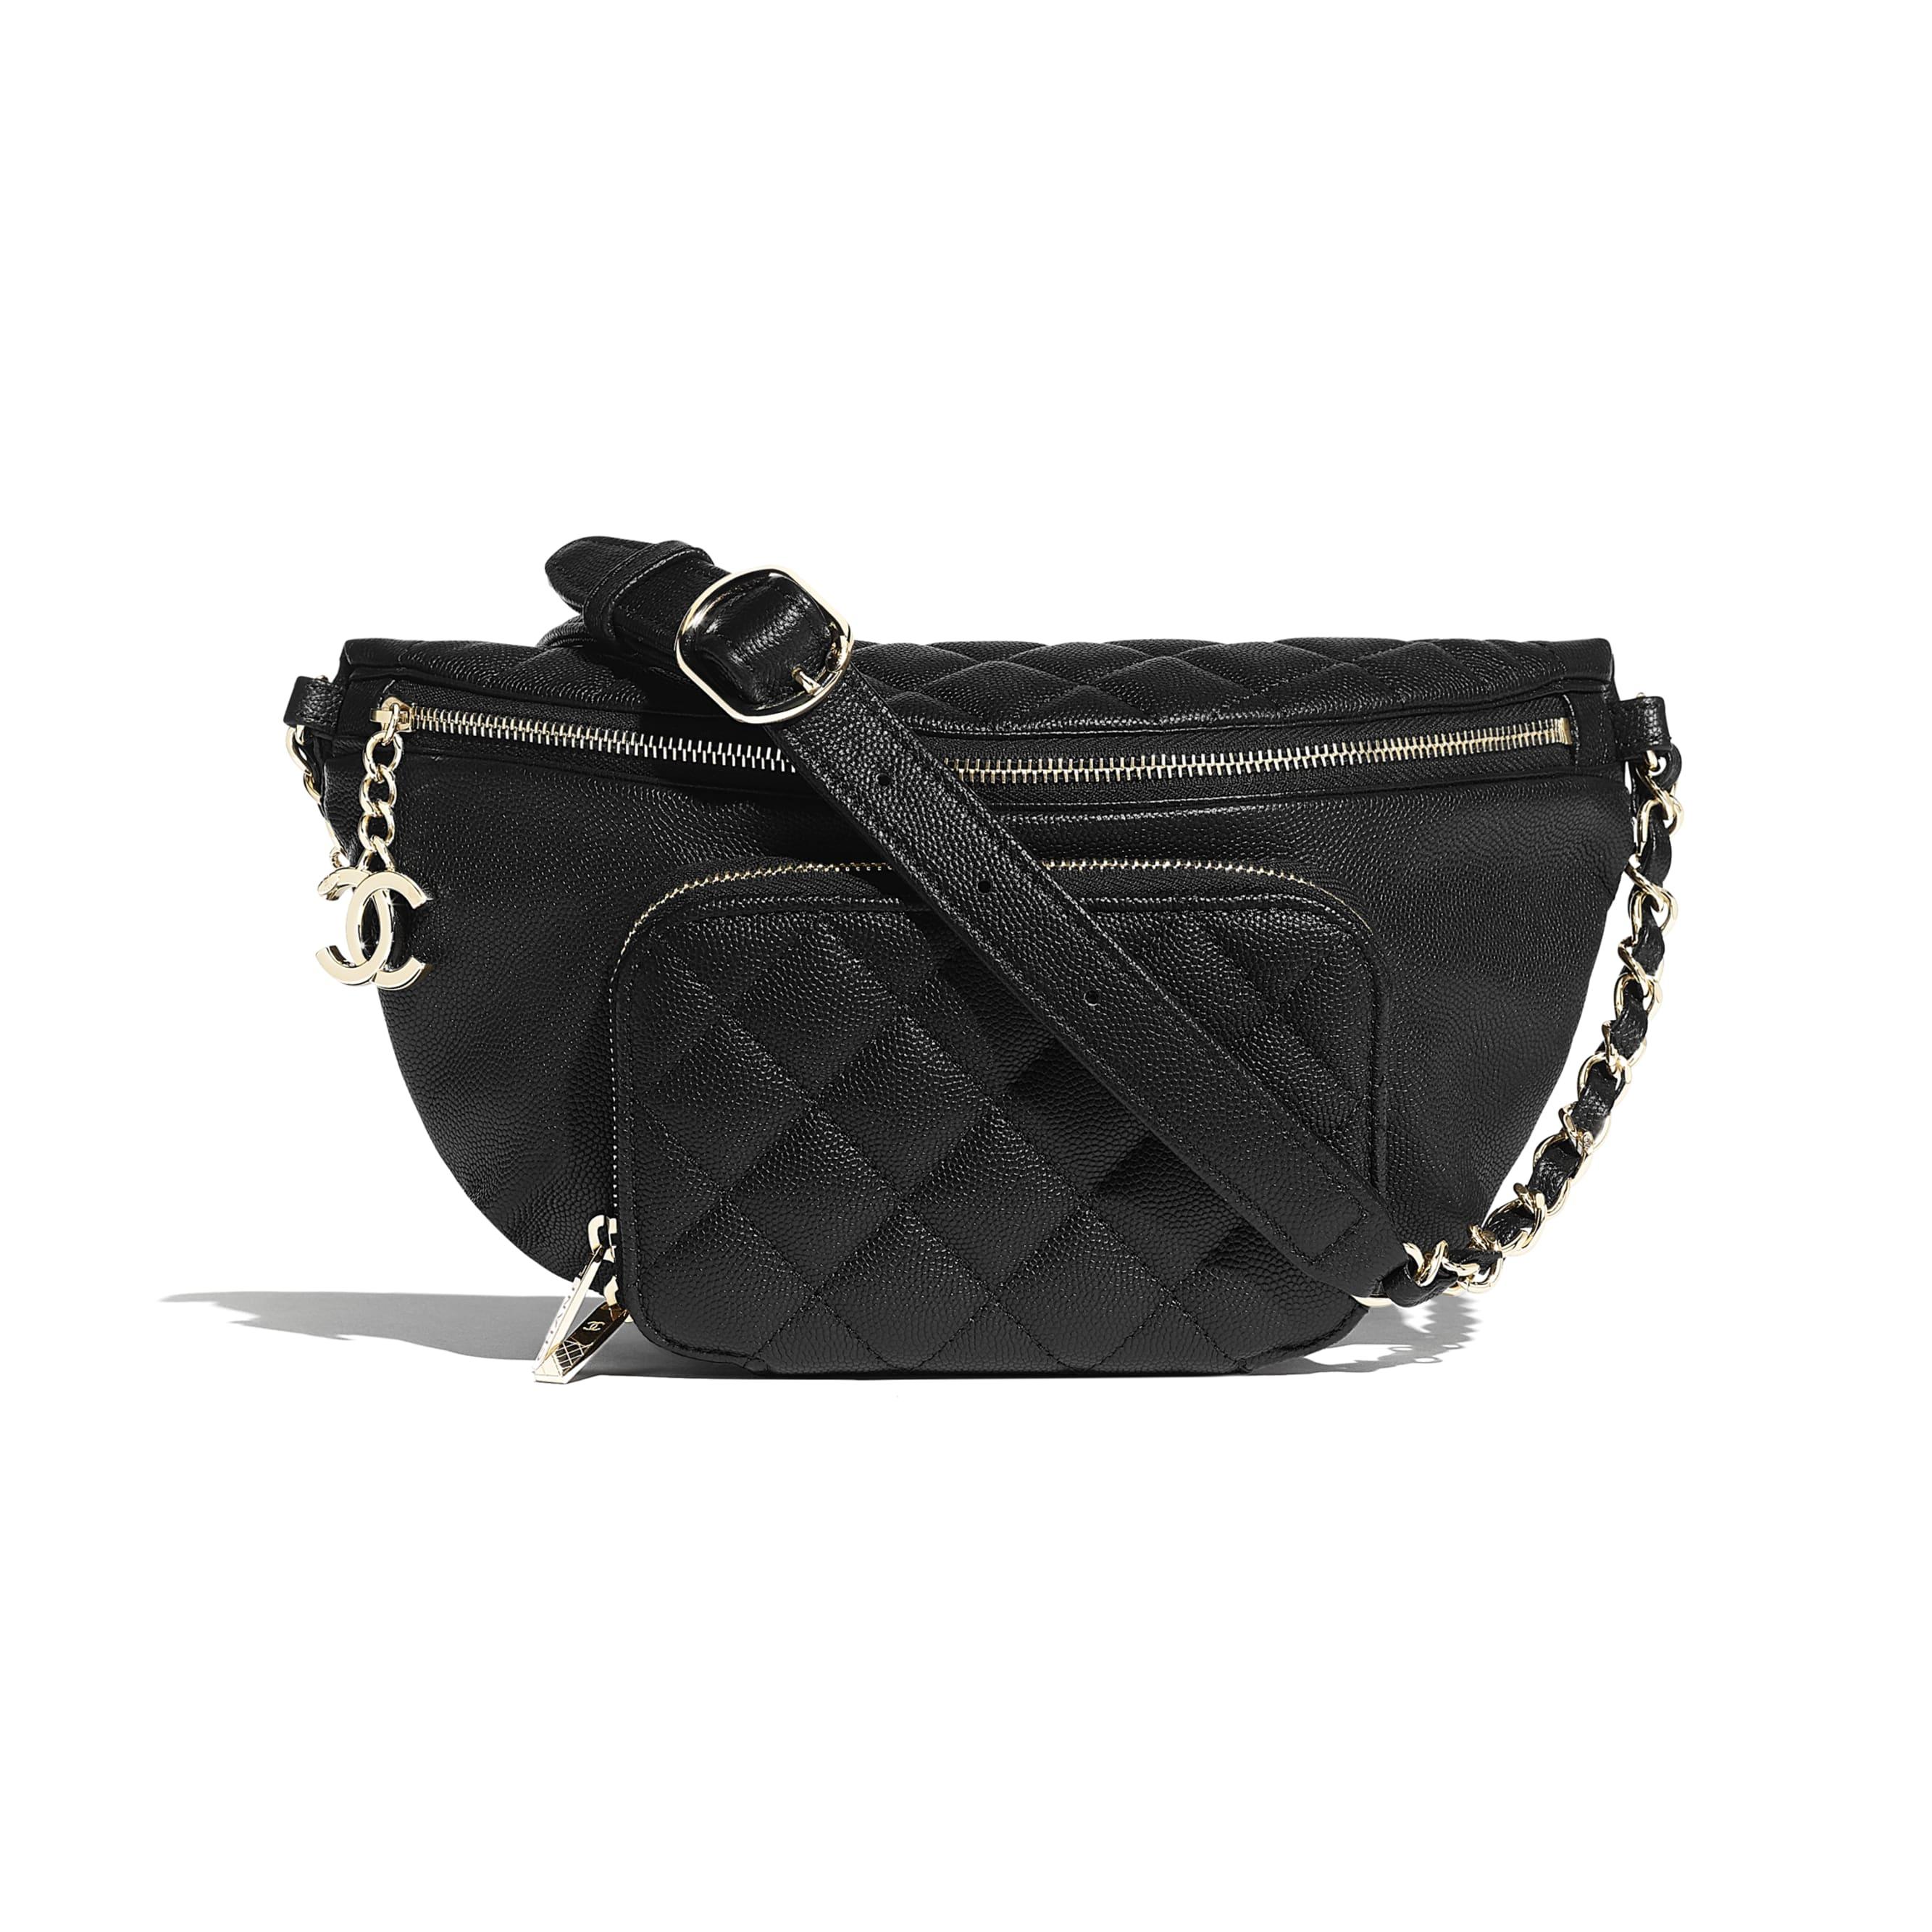 Waist Bag - Black - Grained Calfskin & Gold-Tone Metal - Default view - see standard sized version